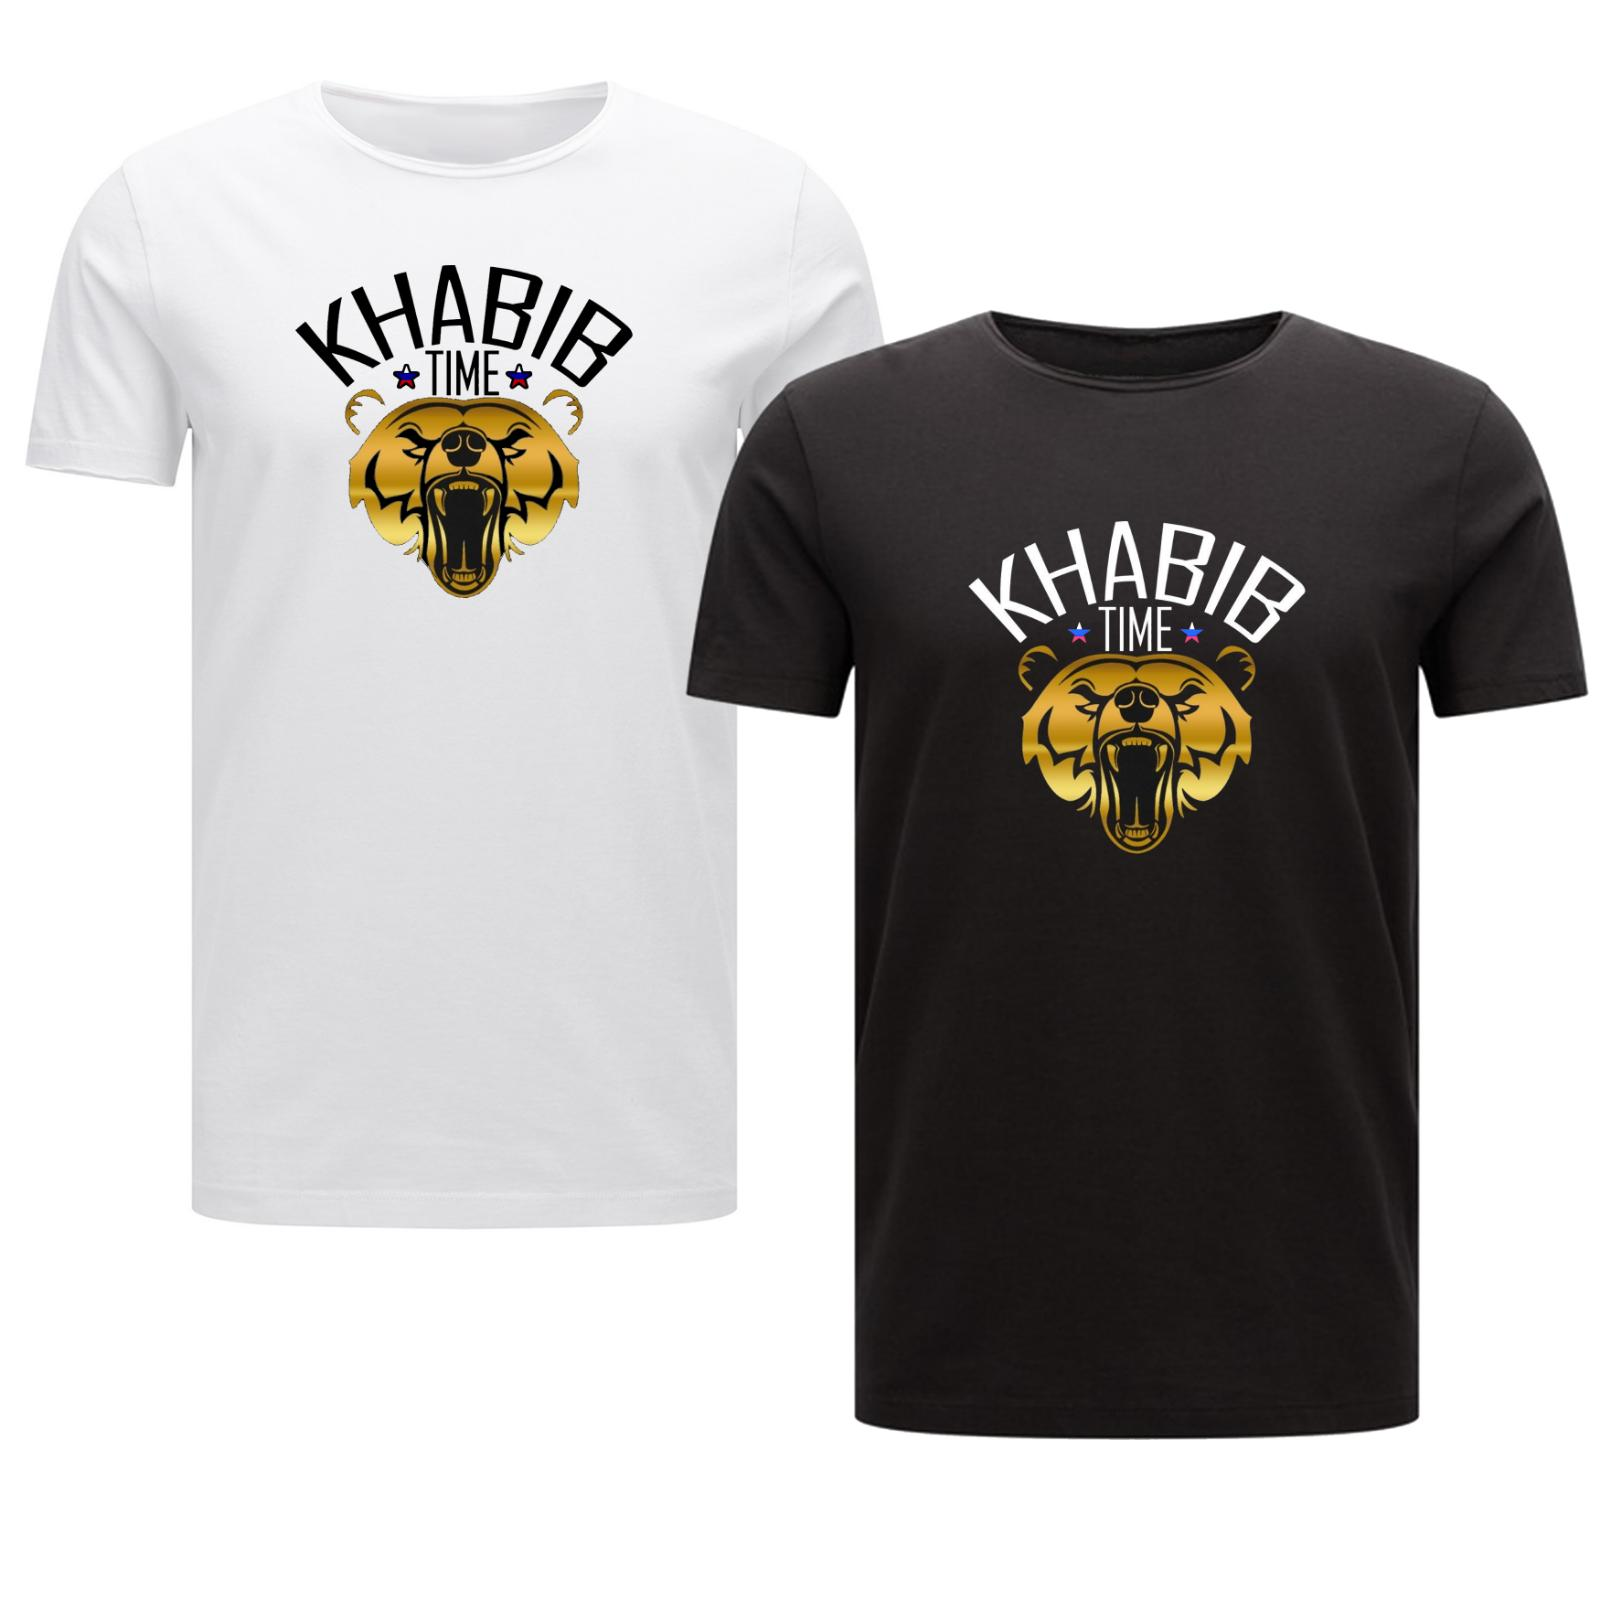 8b4a43200 Khabib Nurmagomedov T SHIRT MMA UFC Mcgregor Wrestling Sambo Top Mens Kids  TeeFunny Unisex Casual Funny Graphic T Shirts Funny T Shirts For Sale From  ...